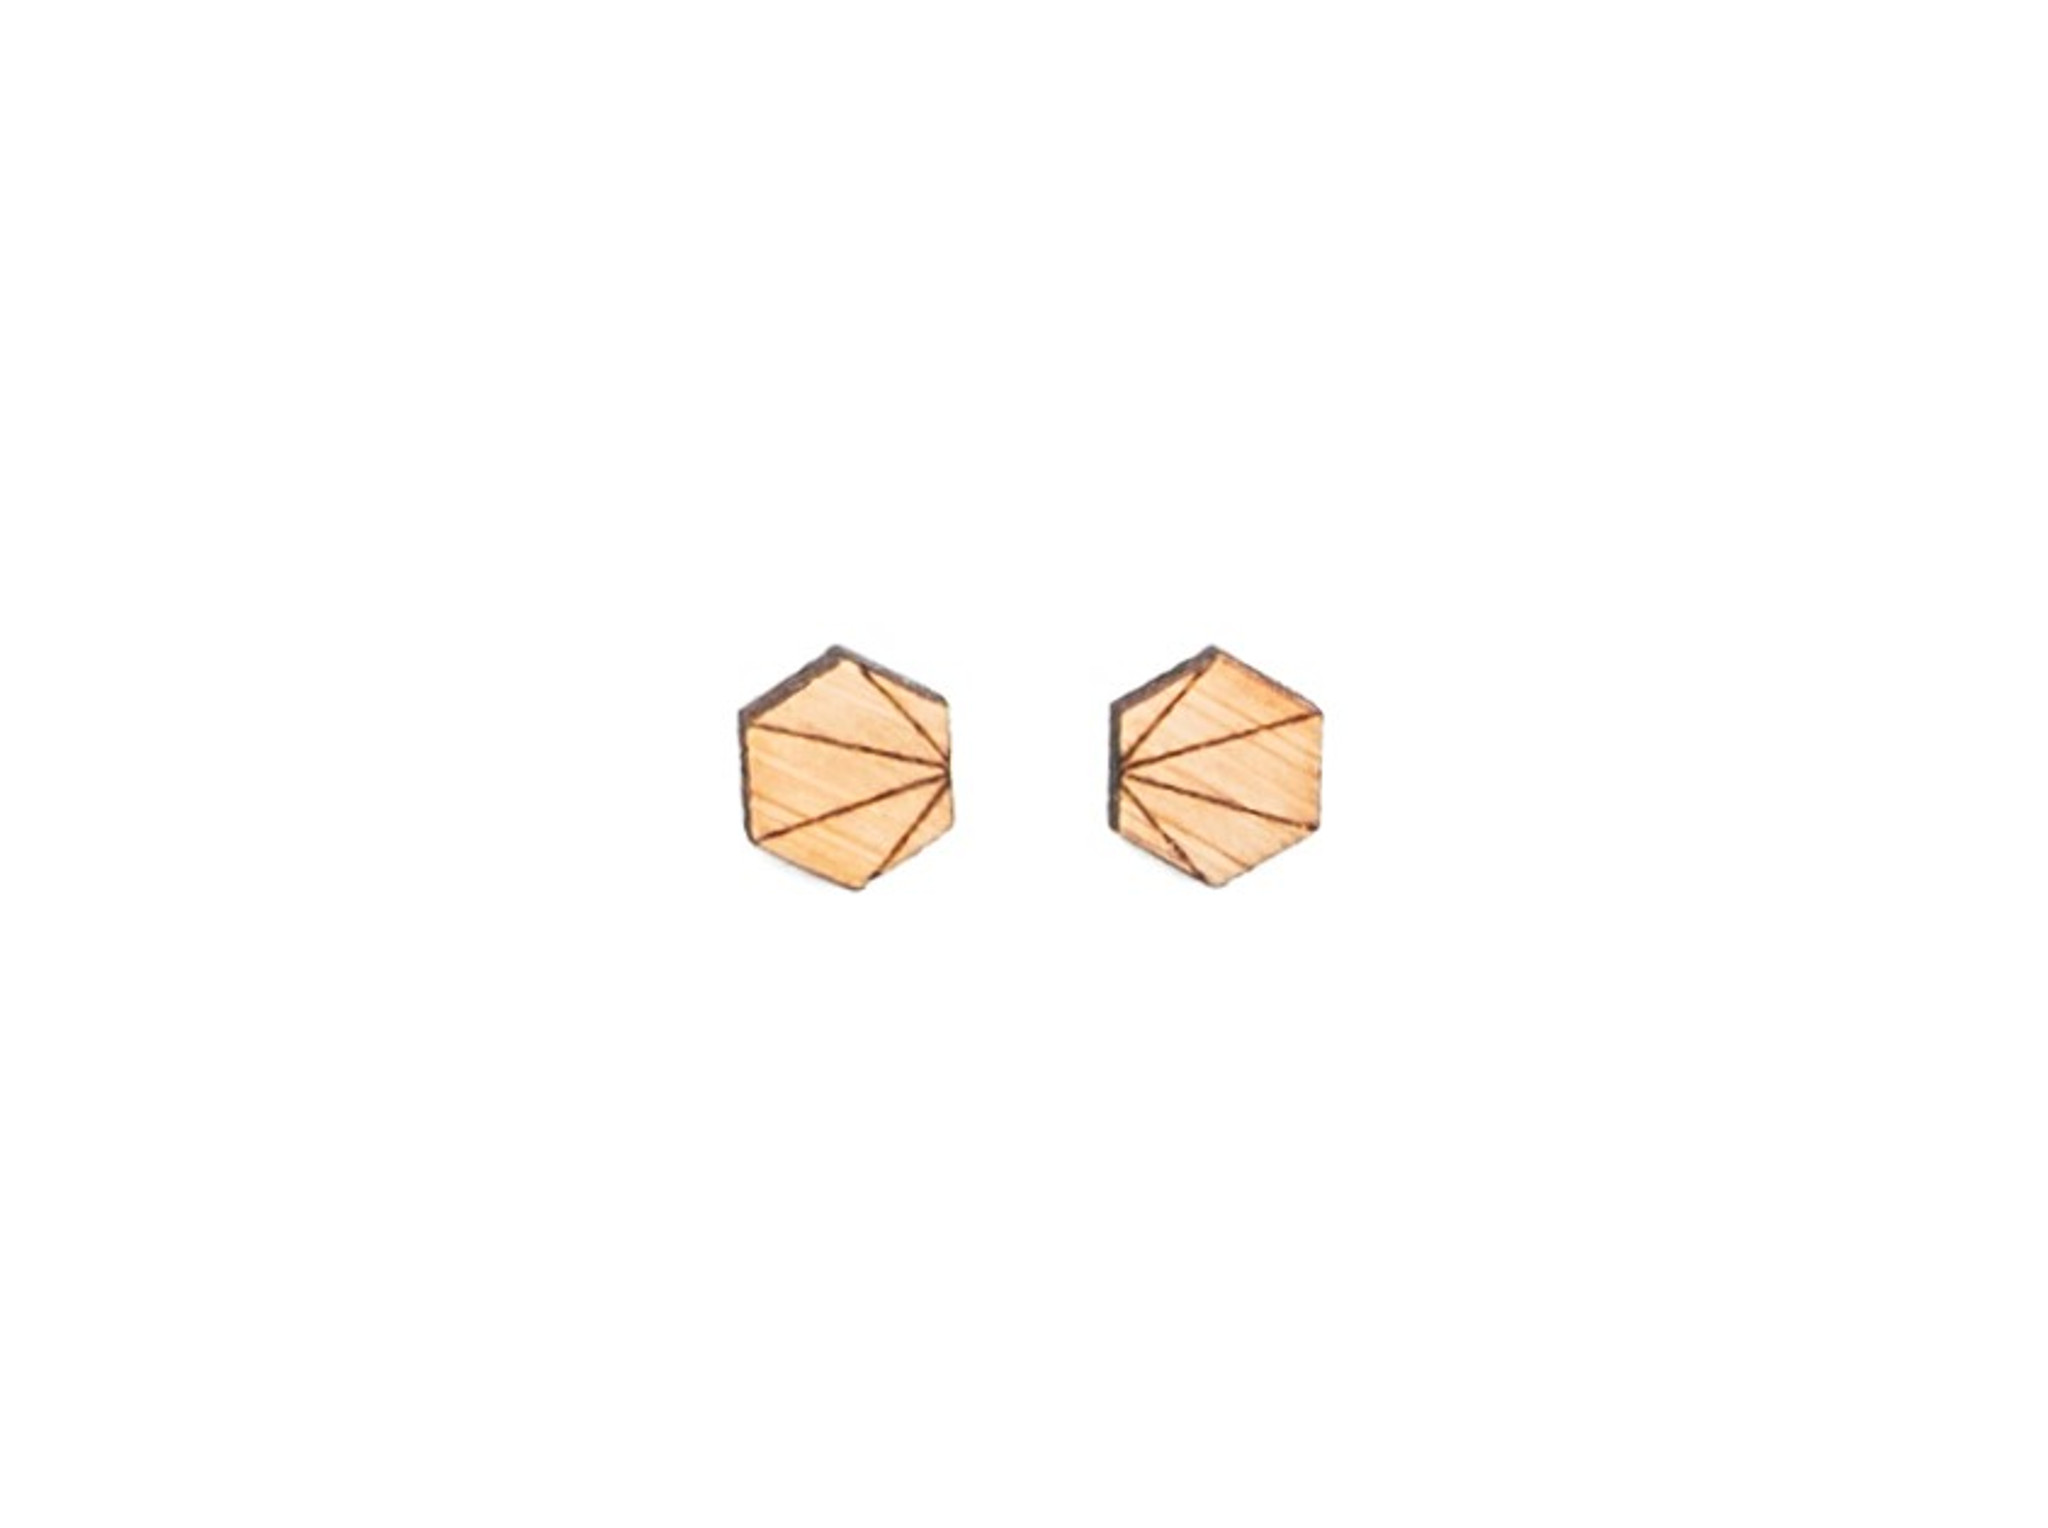 hexagon wood mens earrings